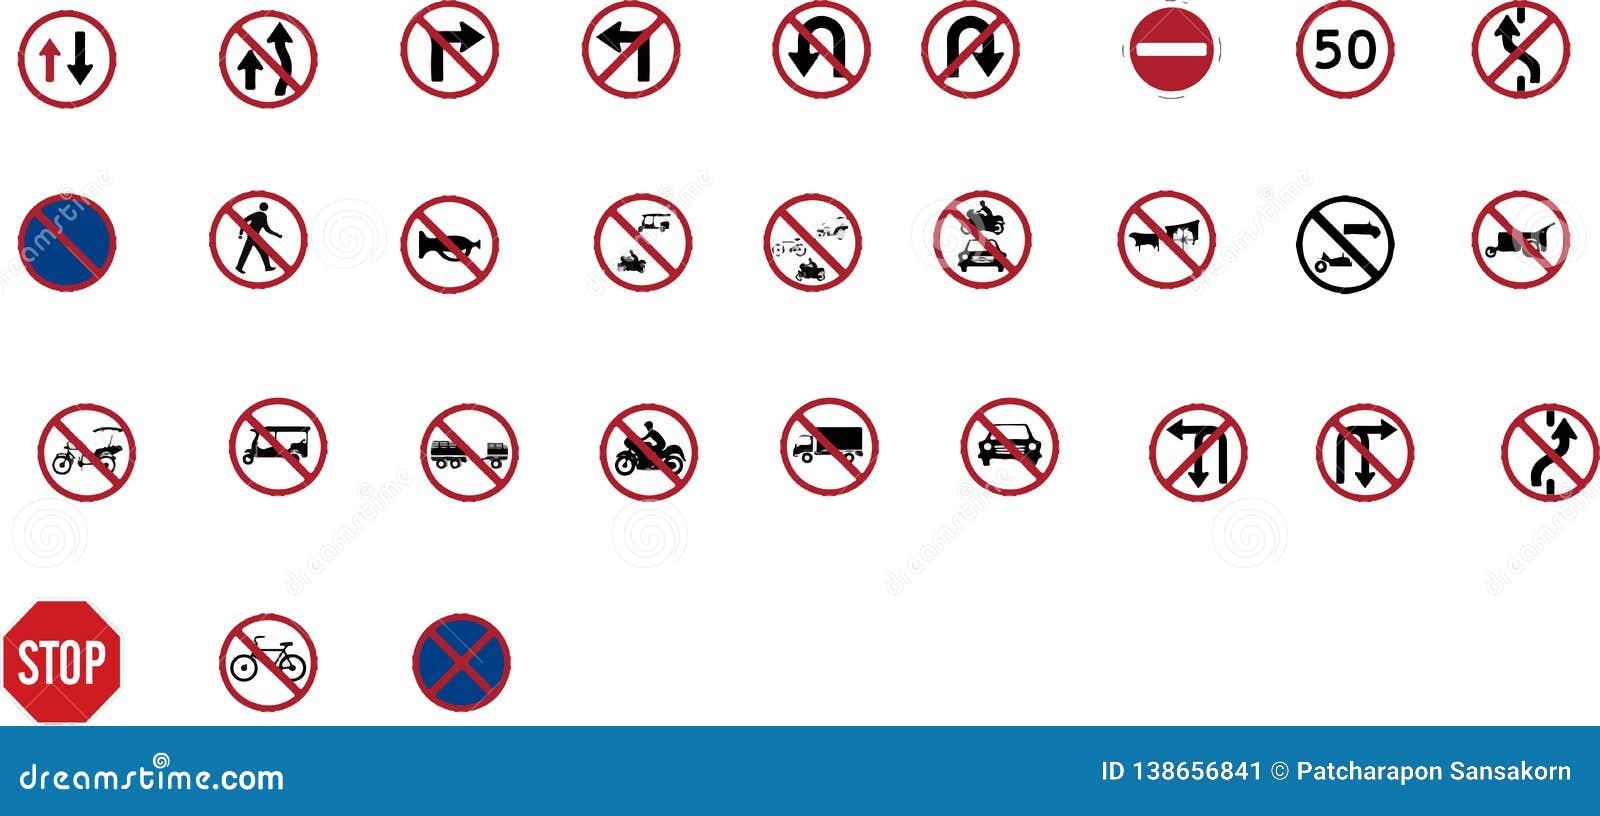 Red traffic signal stock illustration  Illustration of users - 138656841